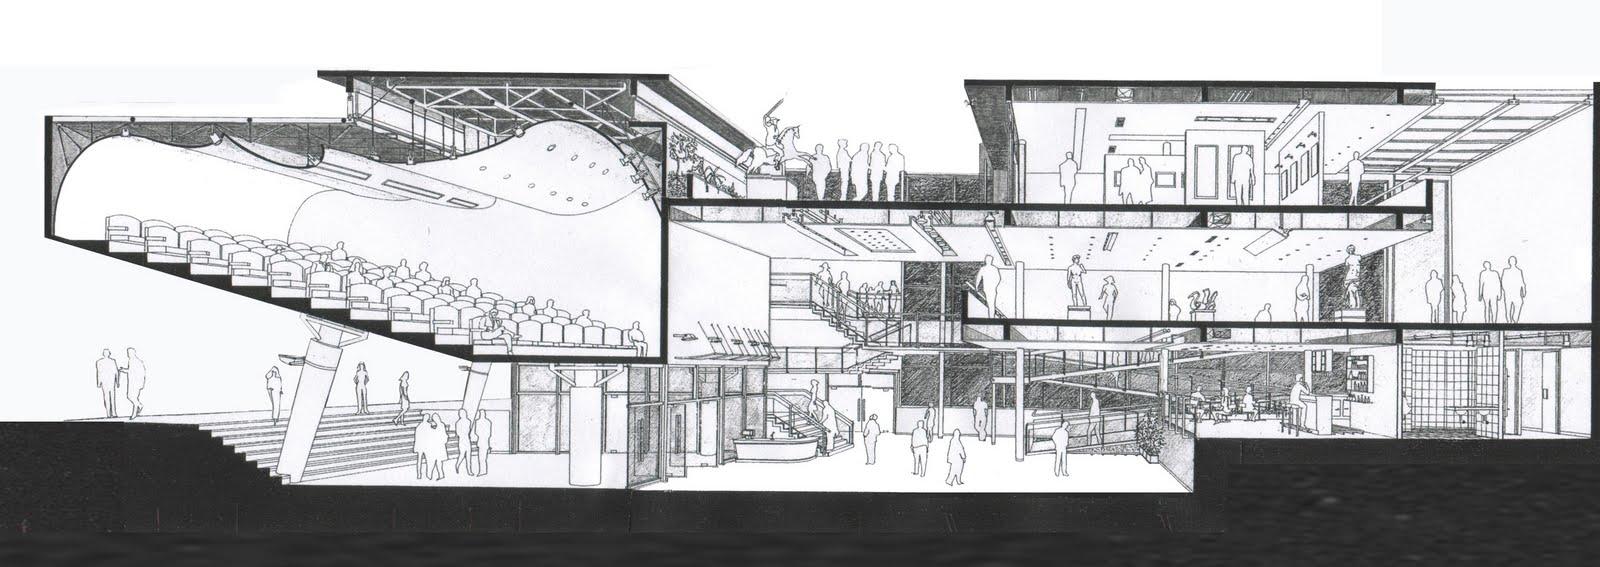 La carpeta de sebas arquitectura 1 for Arquitectura nota de corte